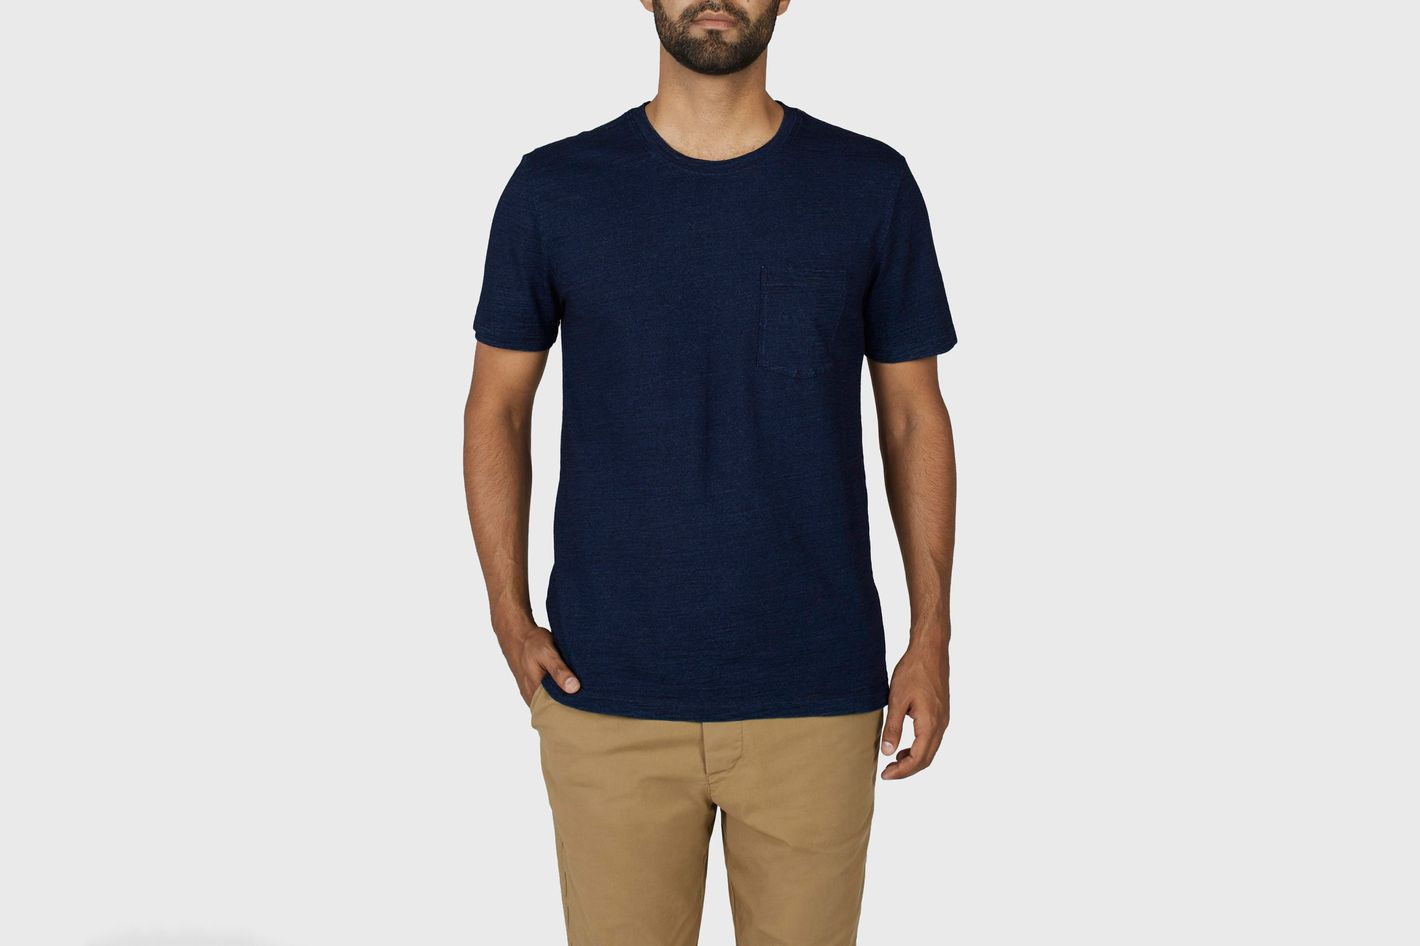 Everlane  Indigo Texture Pocket T-shirt